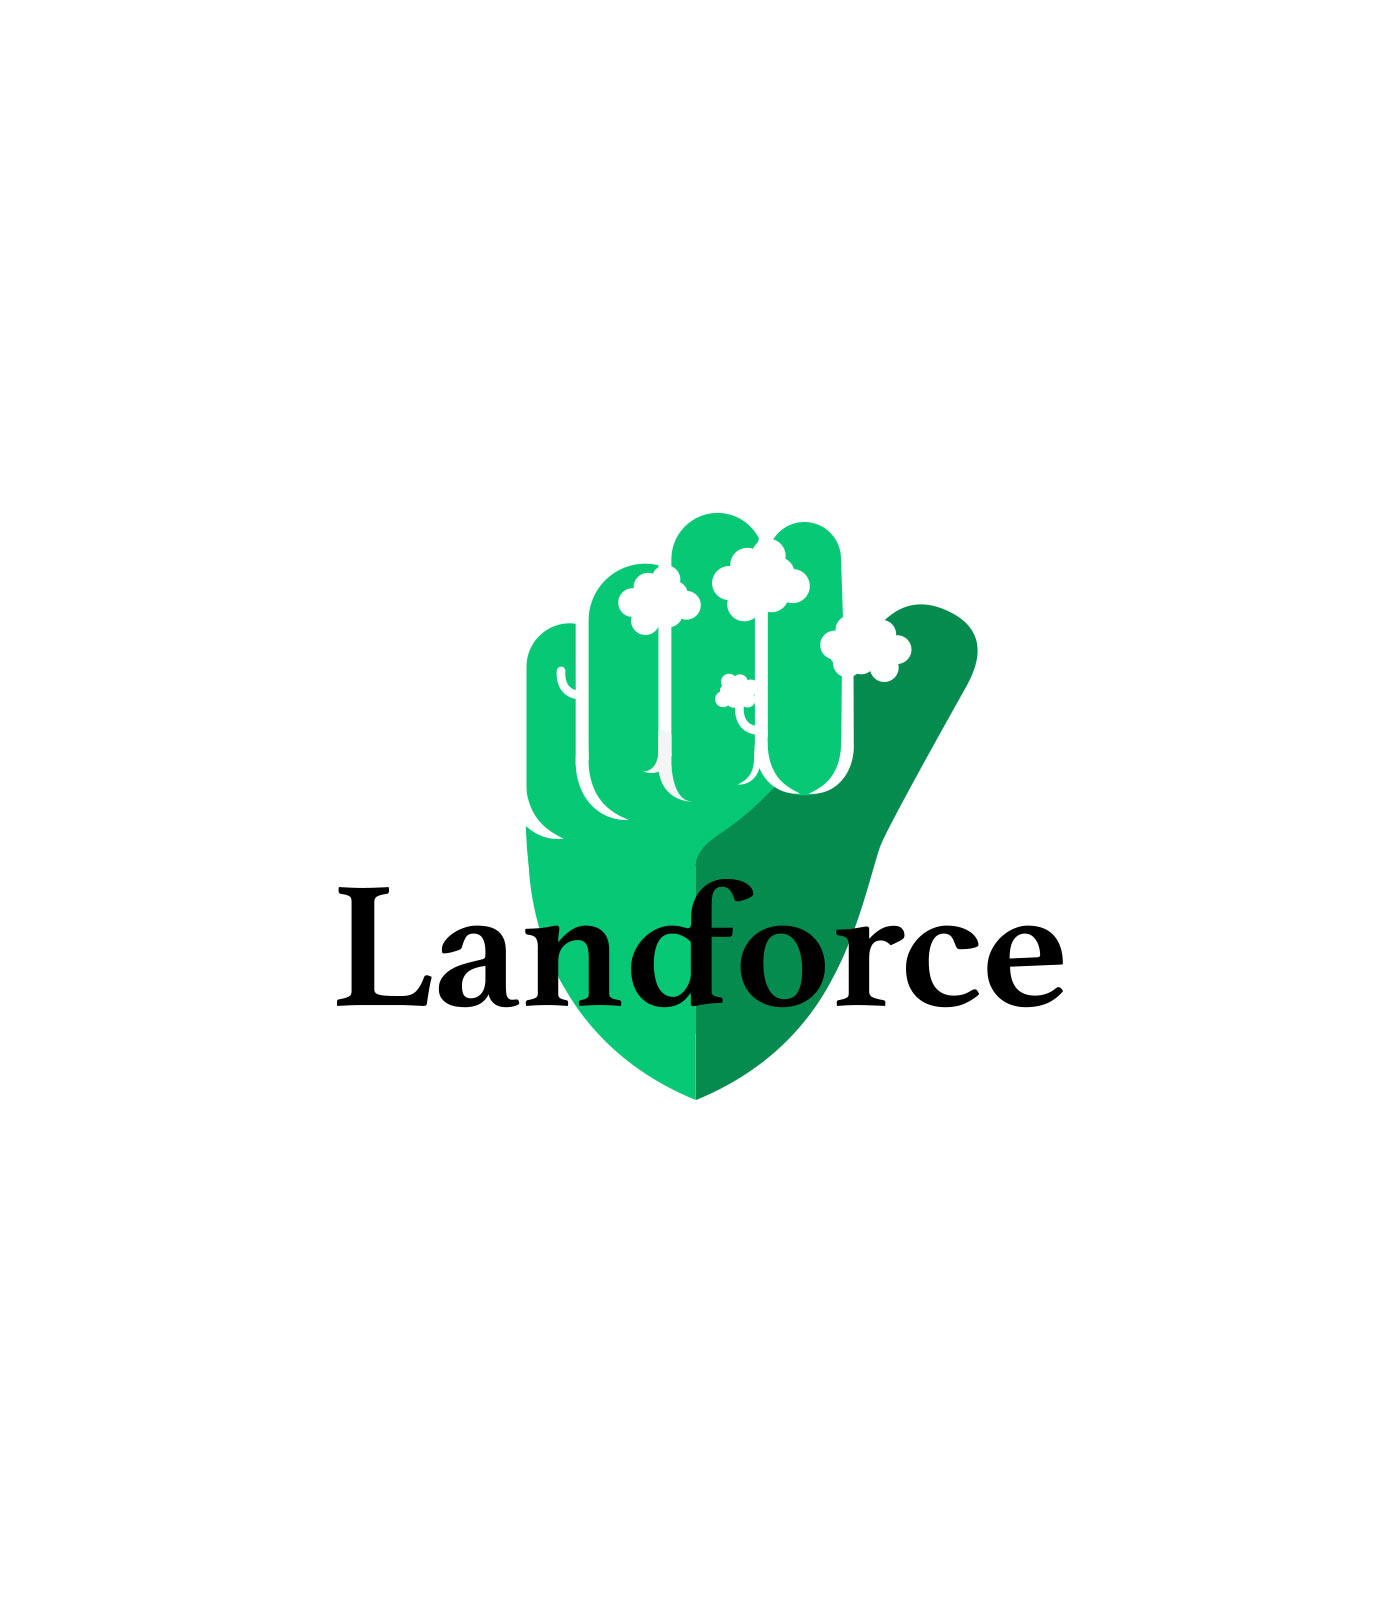 land force logotipo grafico milano chaubet 01